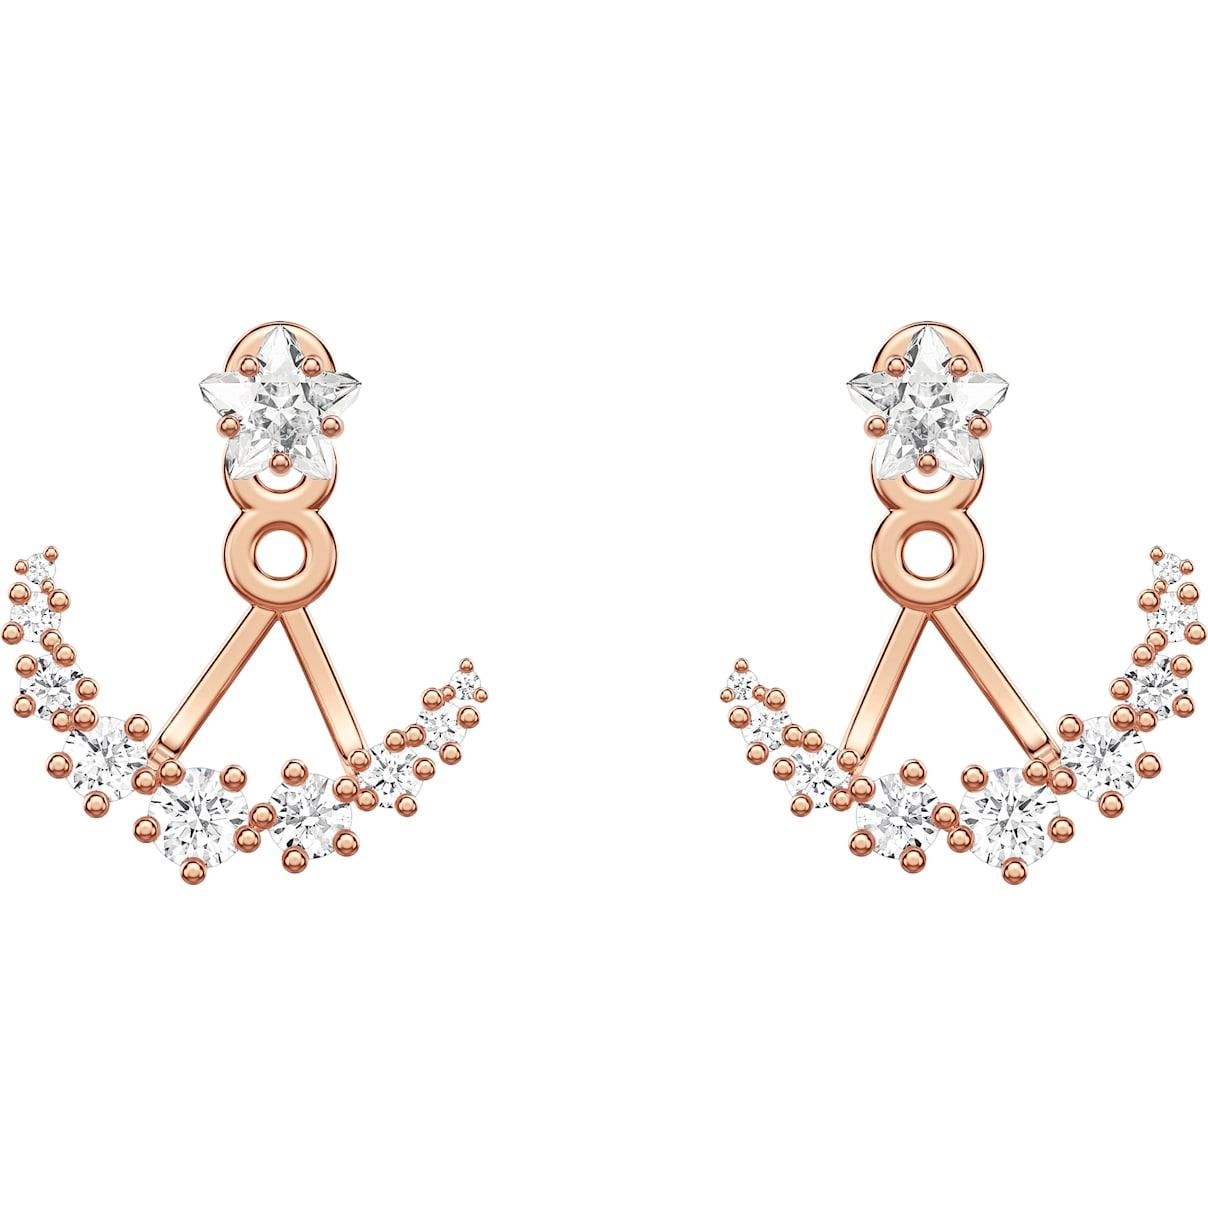 Swarovski Penélope Cruz Moonsun Pierced Earring Jackets, White, Rose-gold tone plated